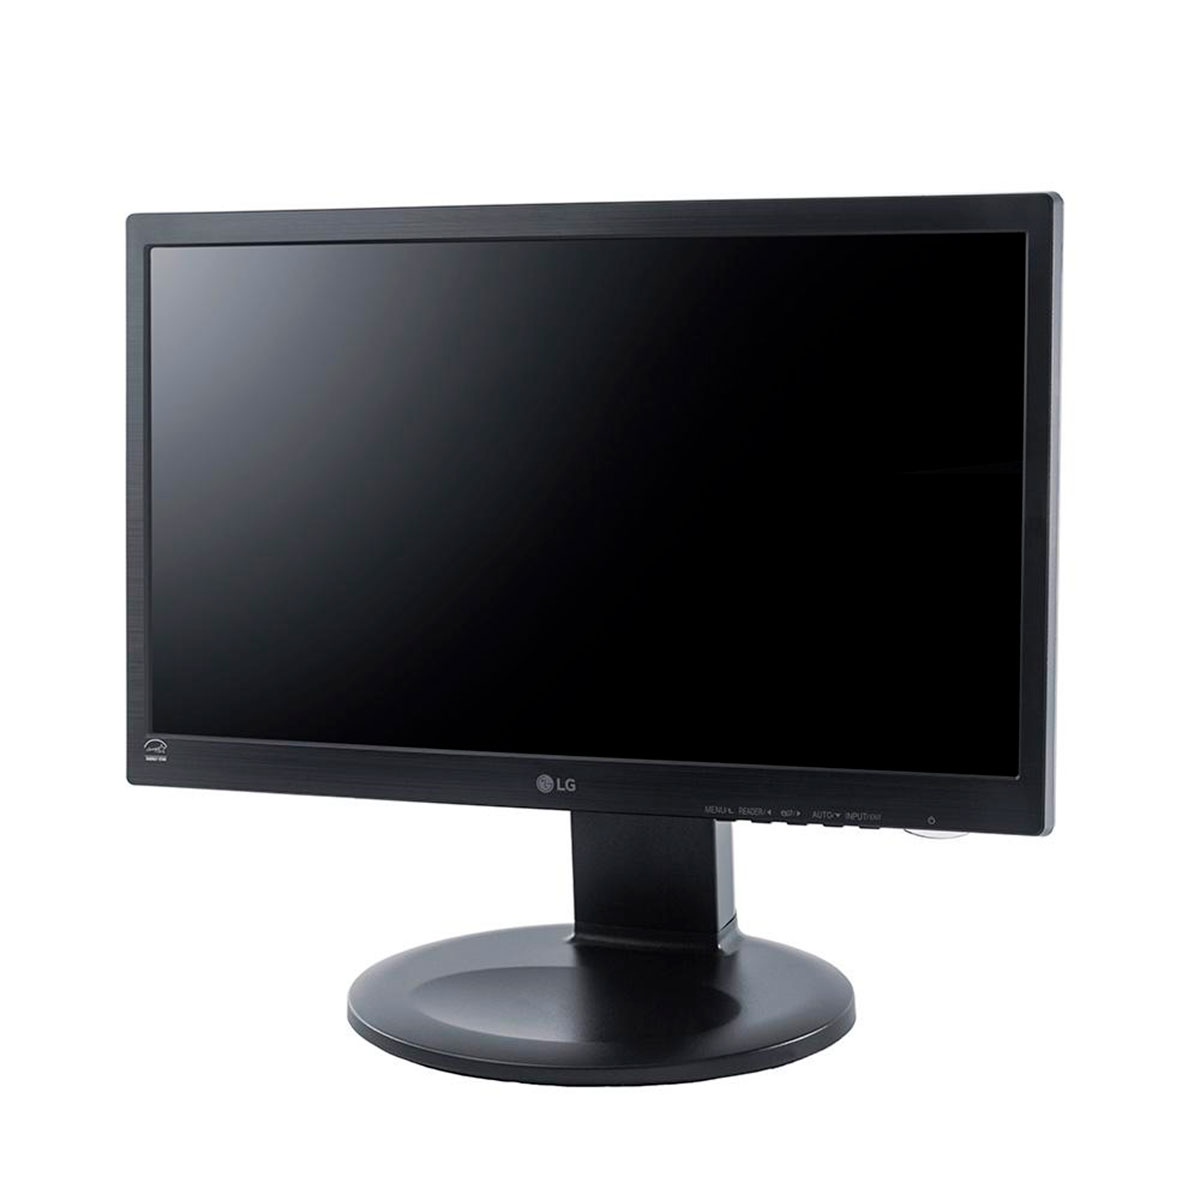 "Monitor LG 20M35PH-B 19.5"" HD TN LED VGA/HDMI Altura Ajustável Preto"